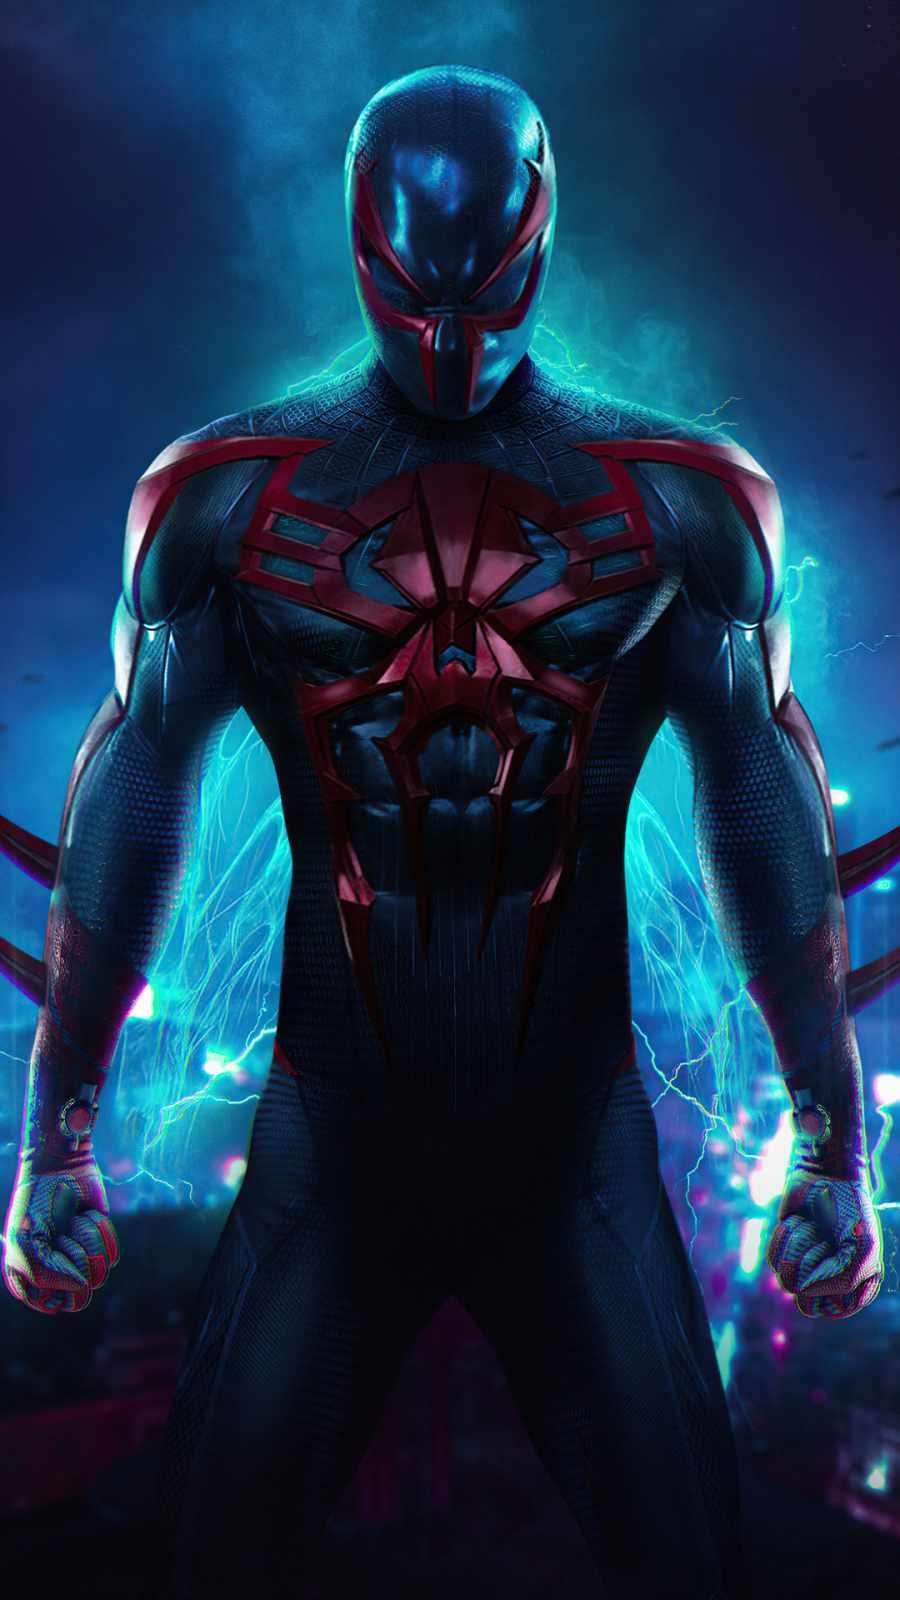 Spider Man 2099 iPhone Wallpaper